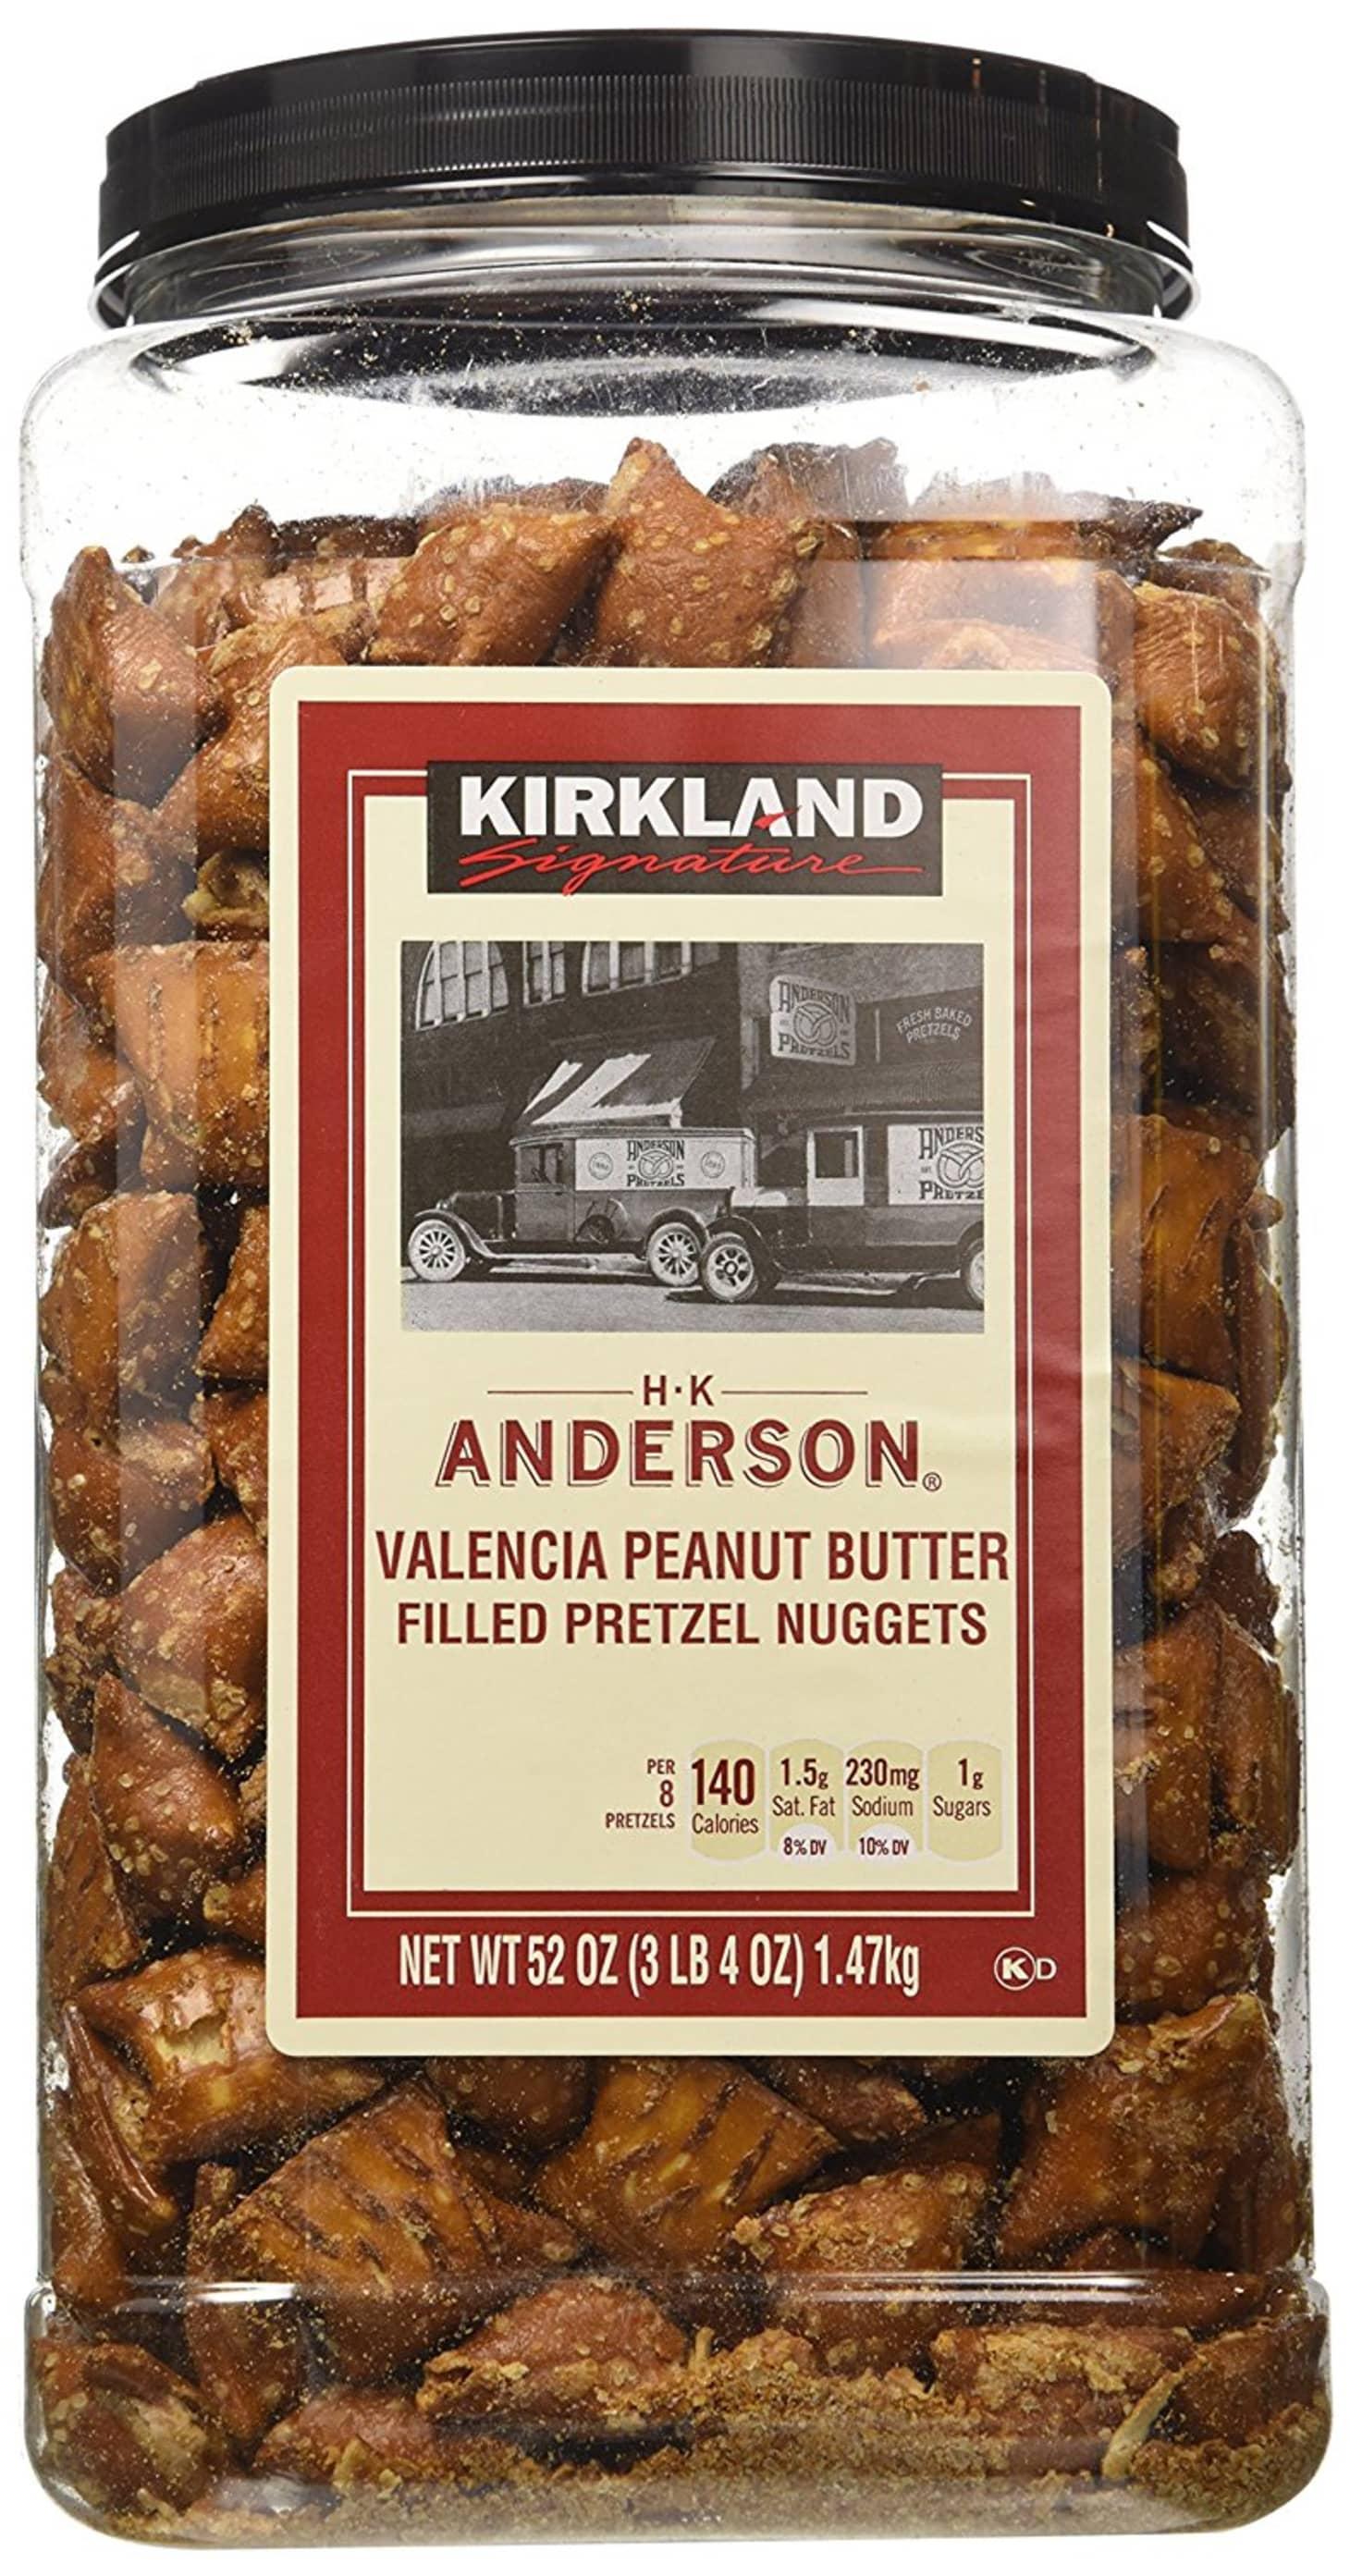 Best Pretzels - Costco Combos Snyders | Kitchn